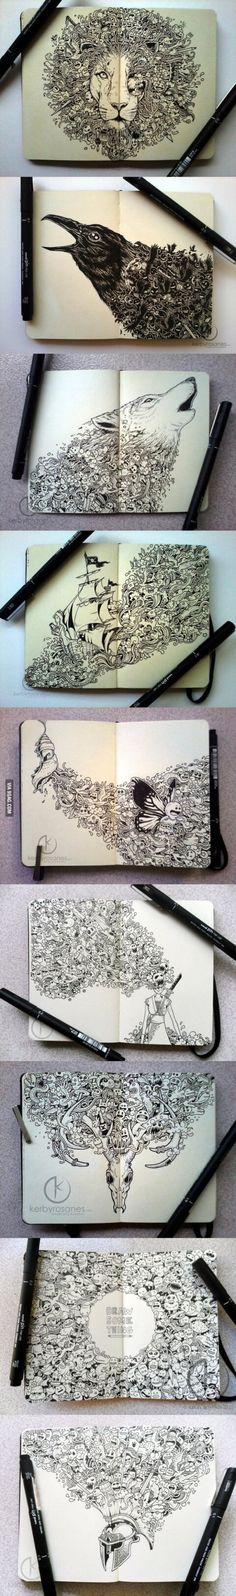 I love this inricate pen art